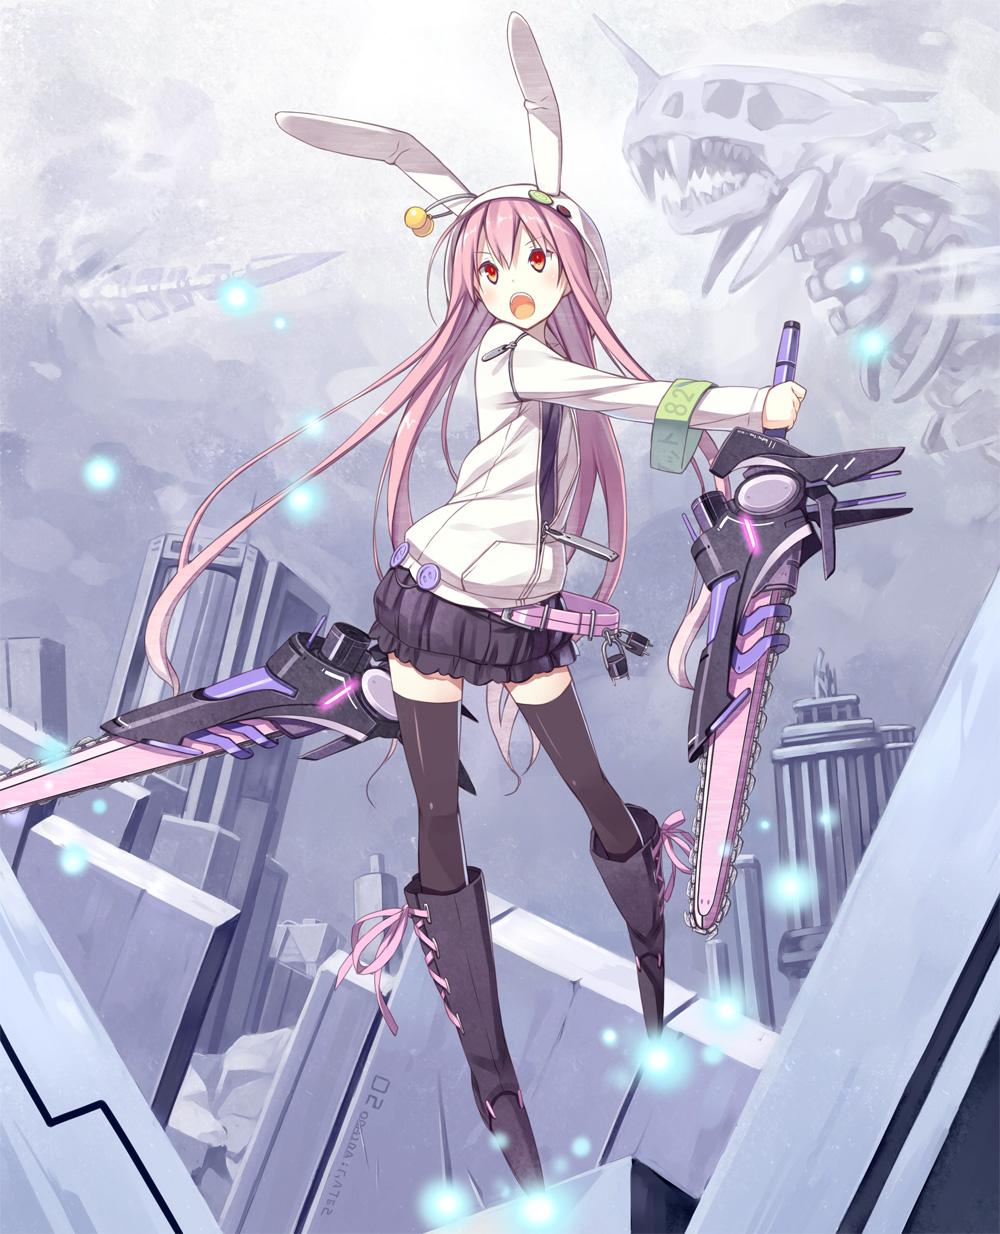 id=33900084,拔剑少女图,武器娘图,二次元手机壁纸